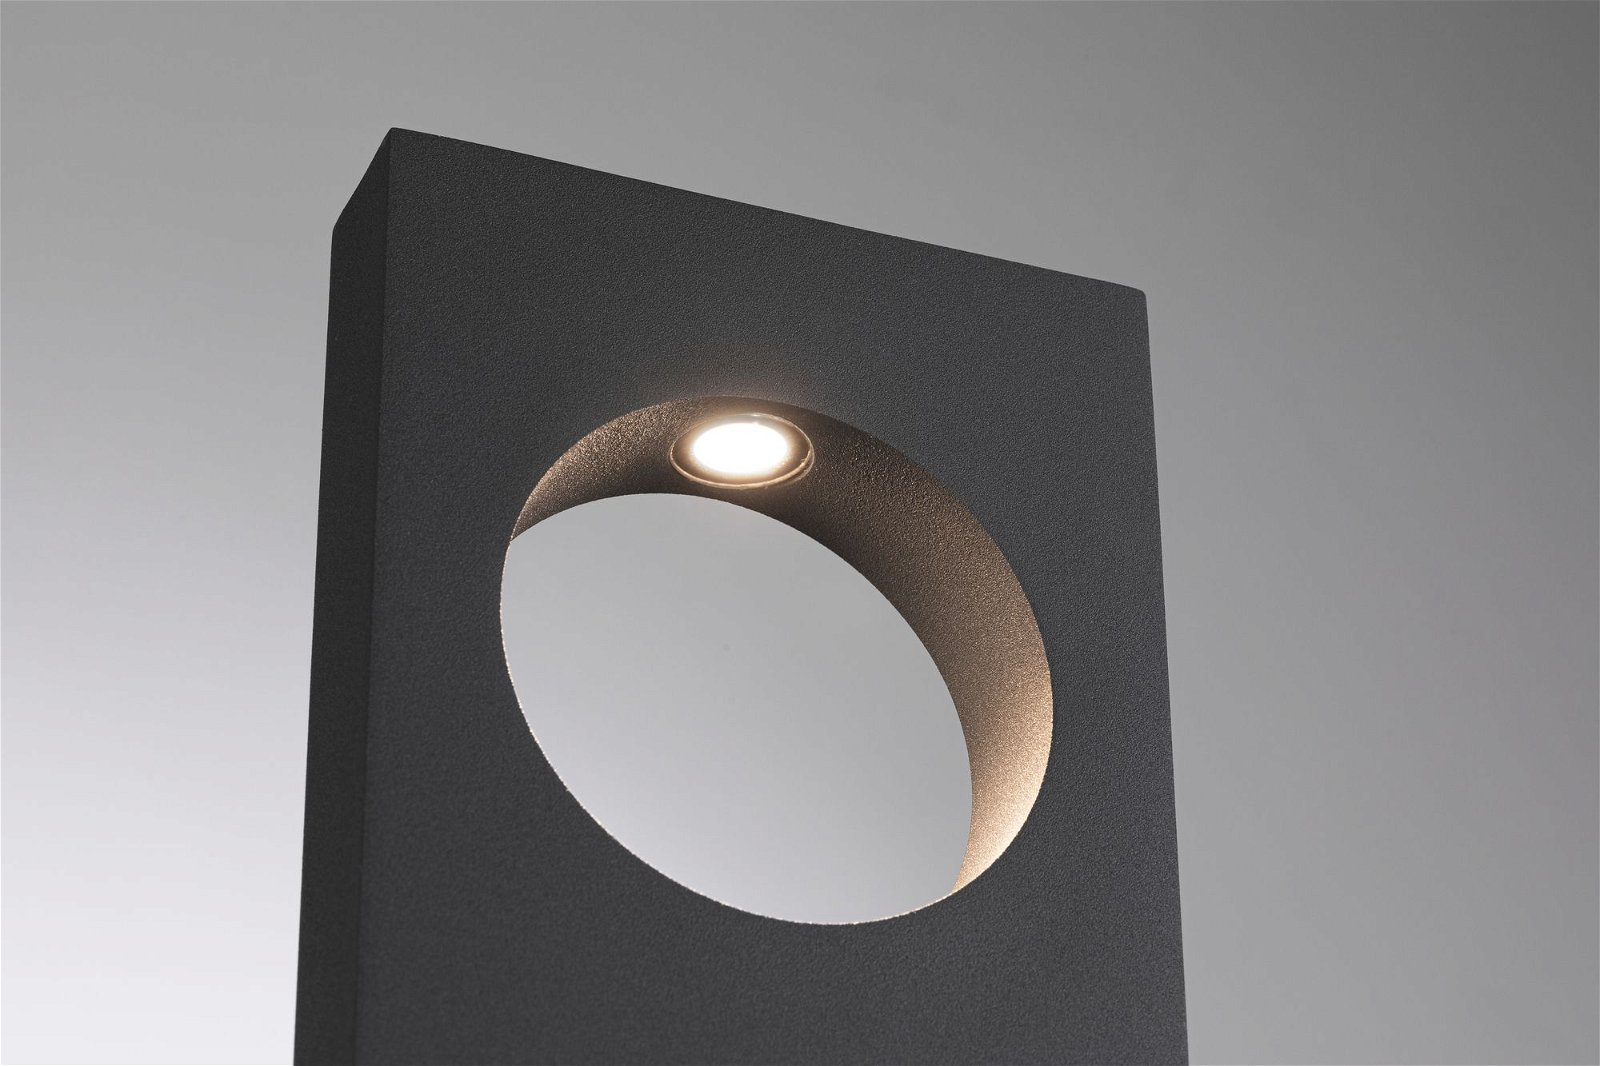 LED Pollerleuchte Ivo IP65 505mm 3000K 5,5W 530lm 230V Grau Aluminium